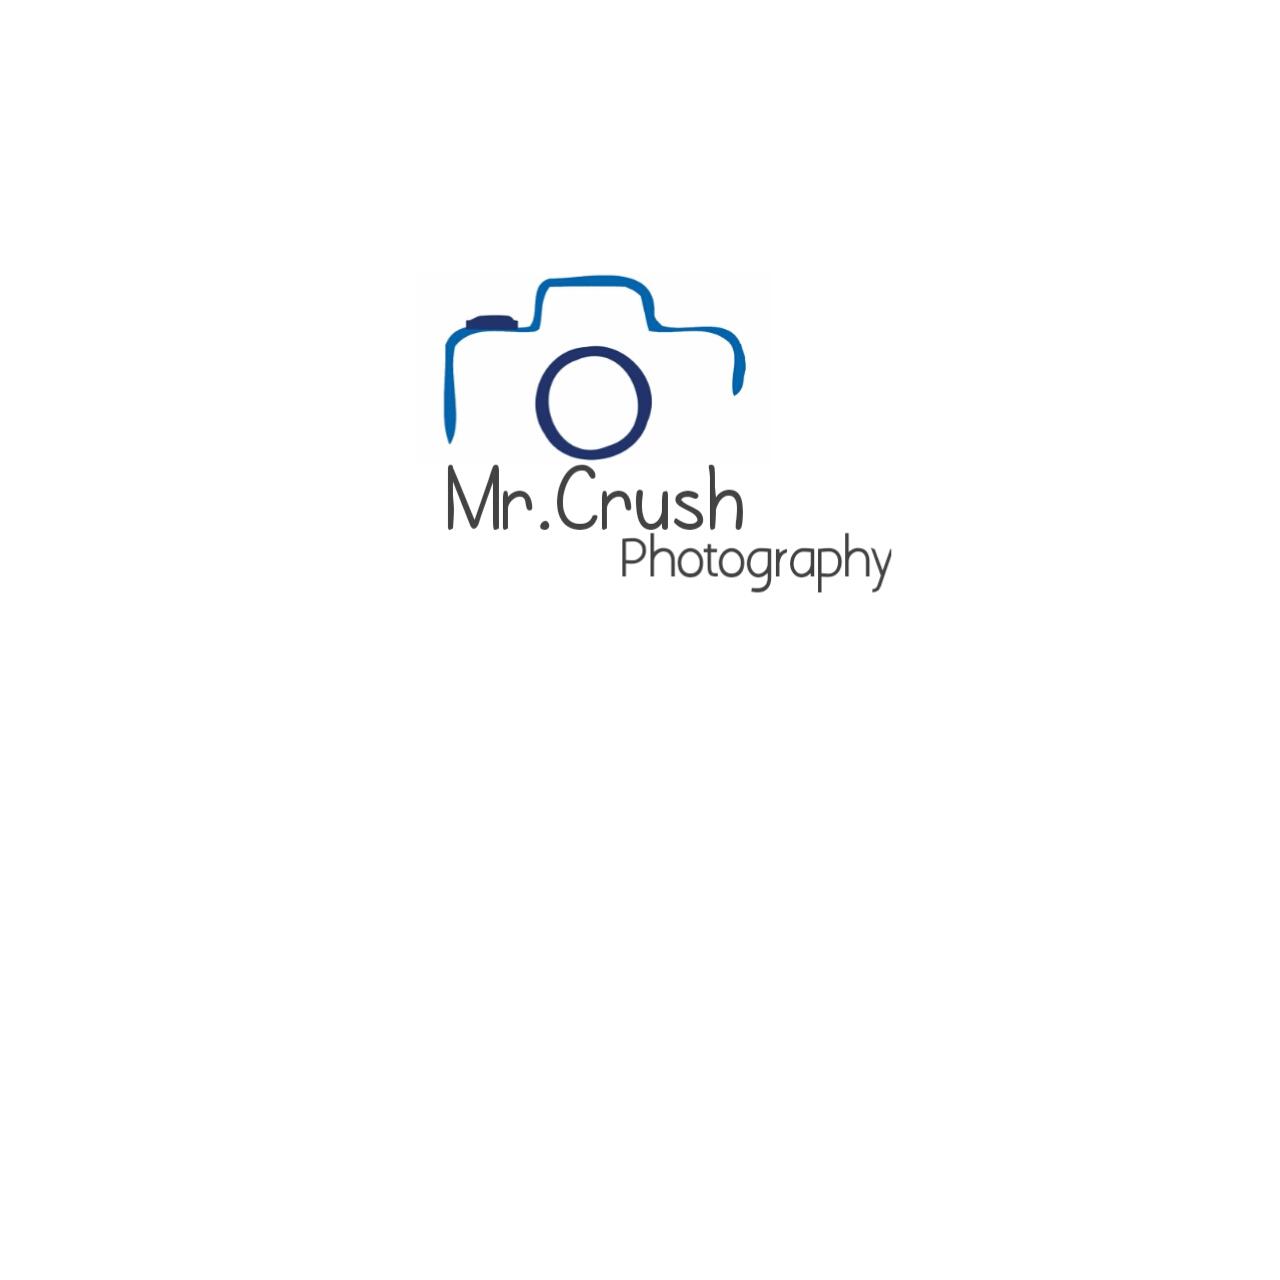 Mr.Crush Photography